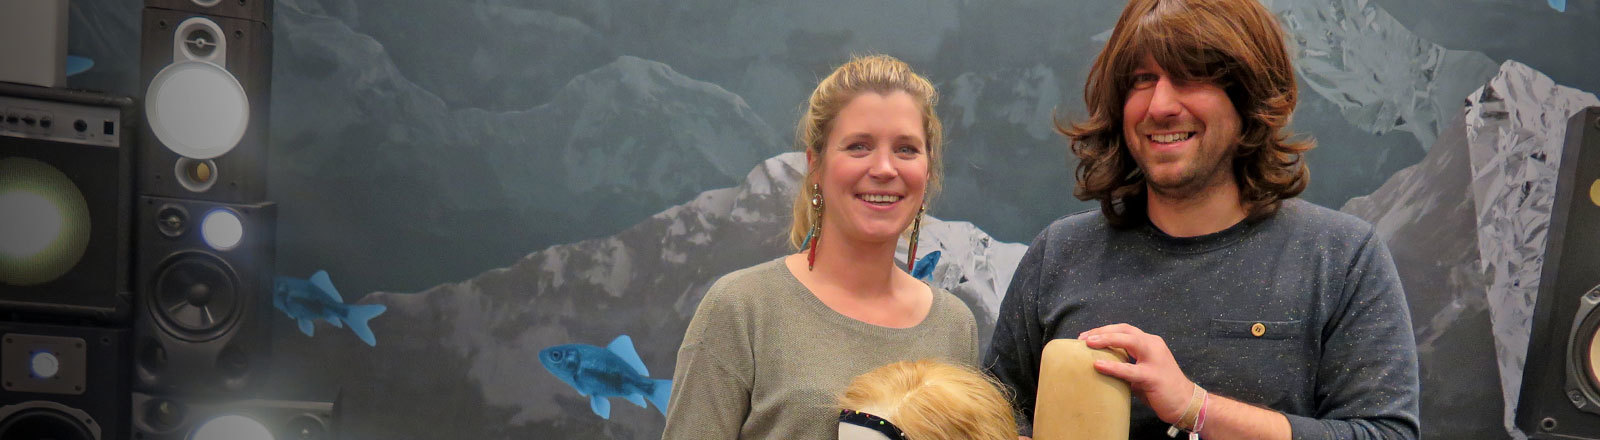 Moderator Sebastian Sonntag mit Perücke zusammen mit Perückenmacherin Tatjana Richartz